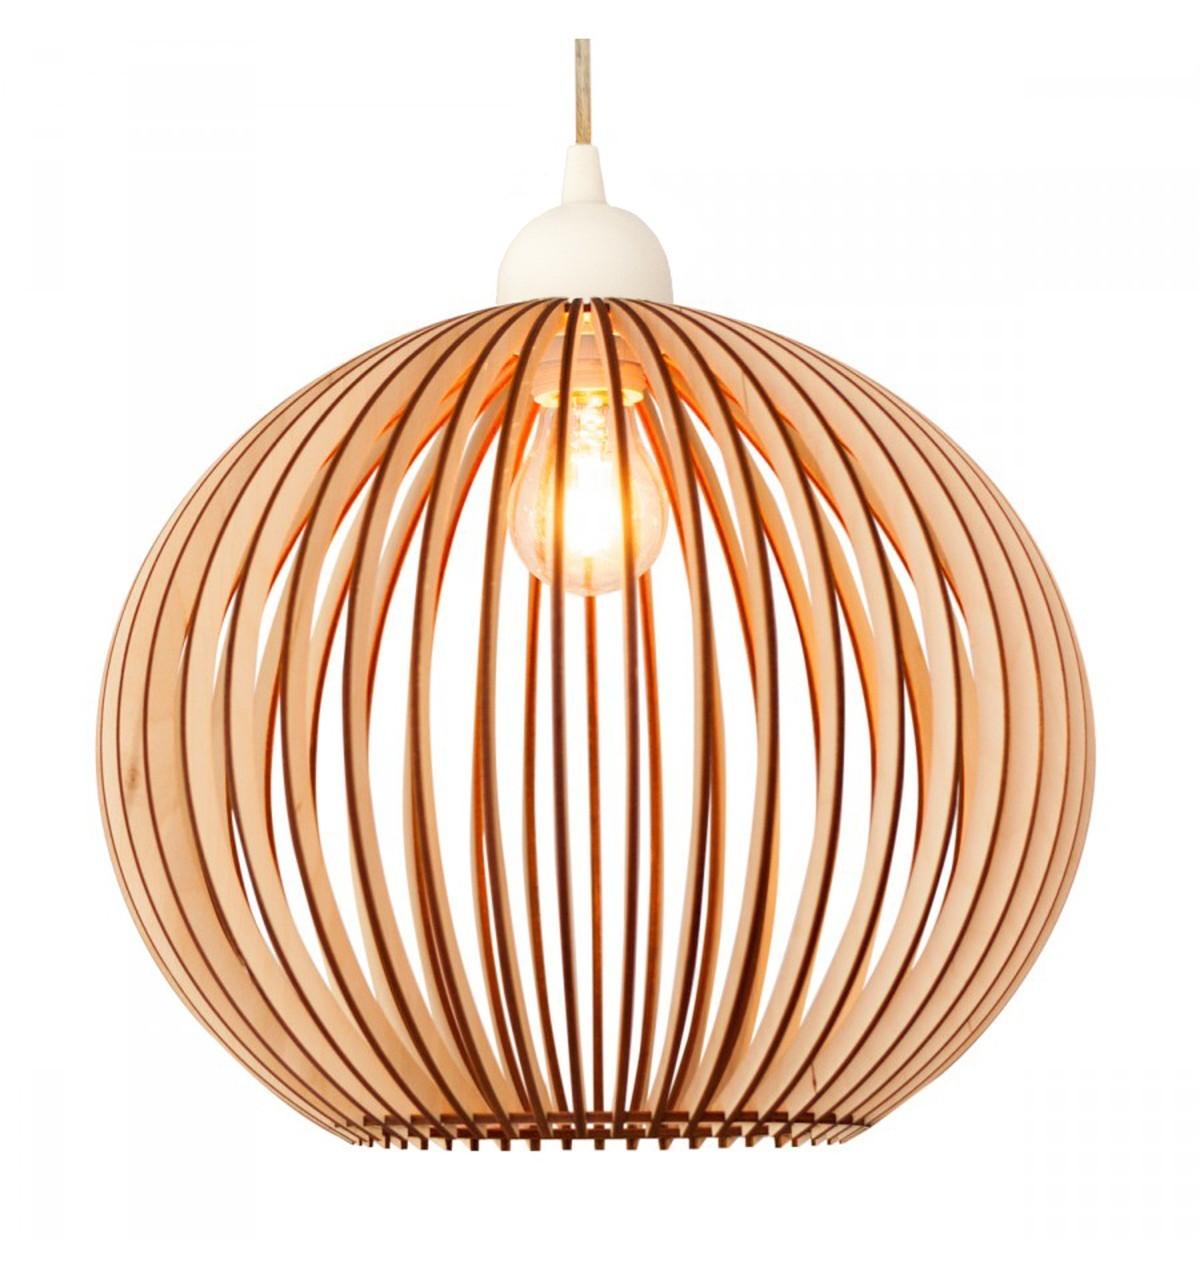 Lampen. Gallery Of Tischlampen With Lampen. Interesting ...